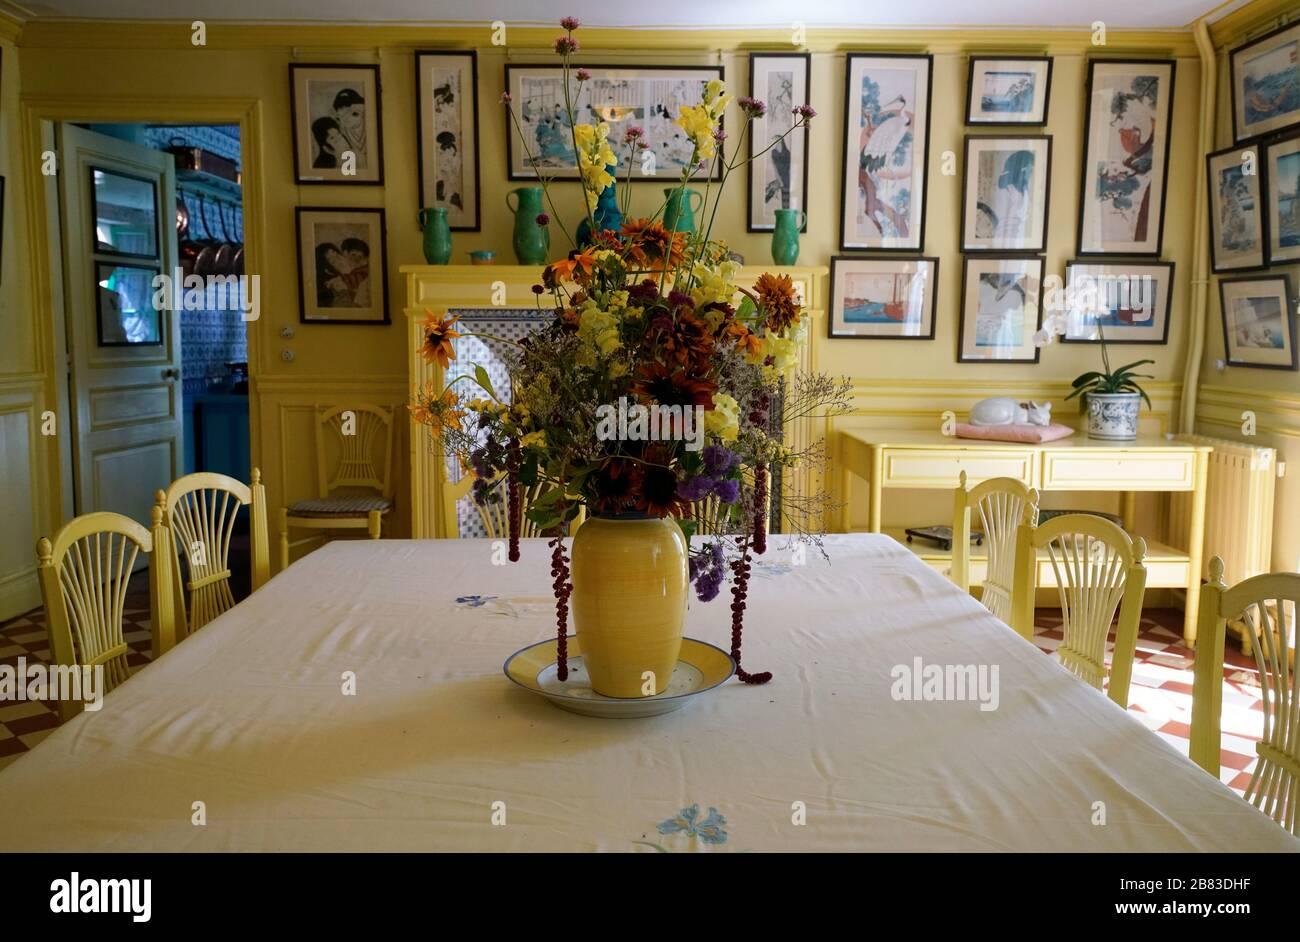 Monet Room Immagini E Fotos Stock Alamy